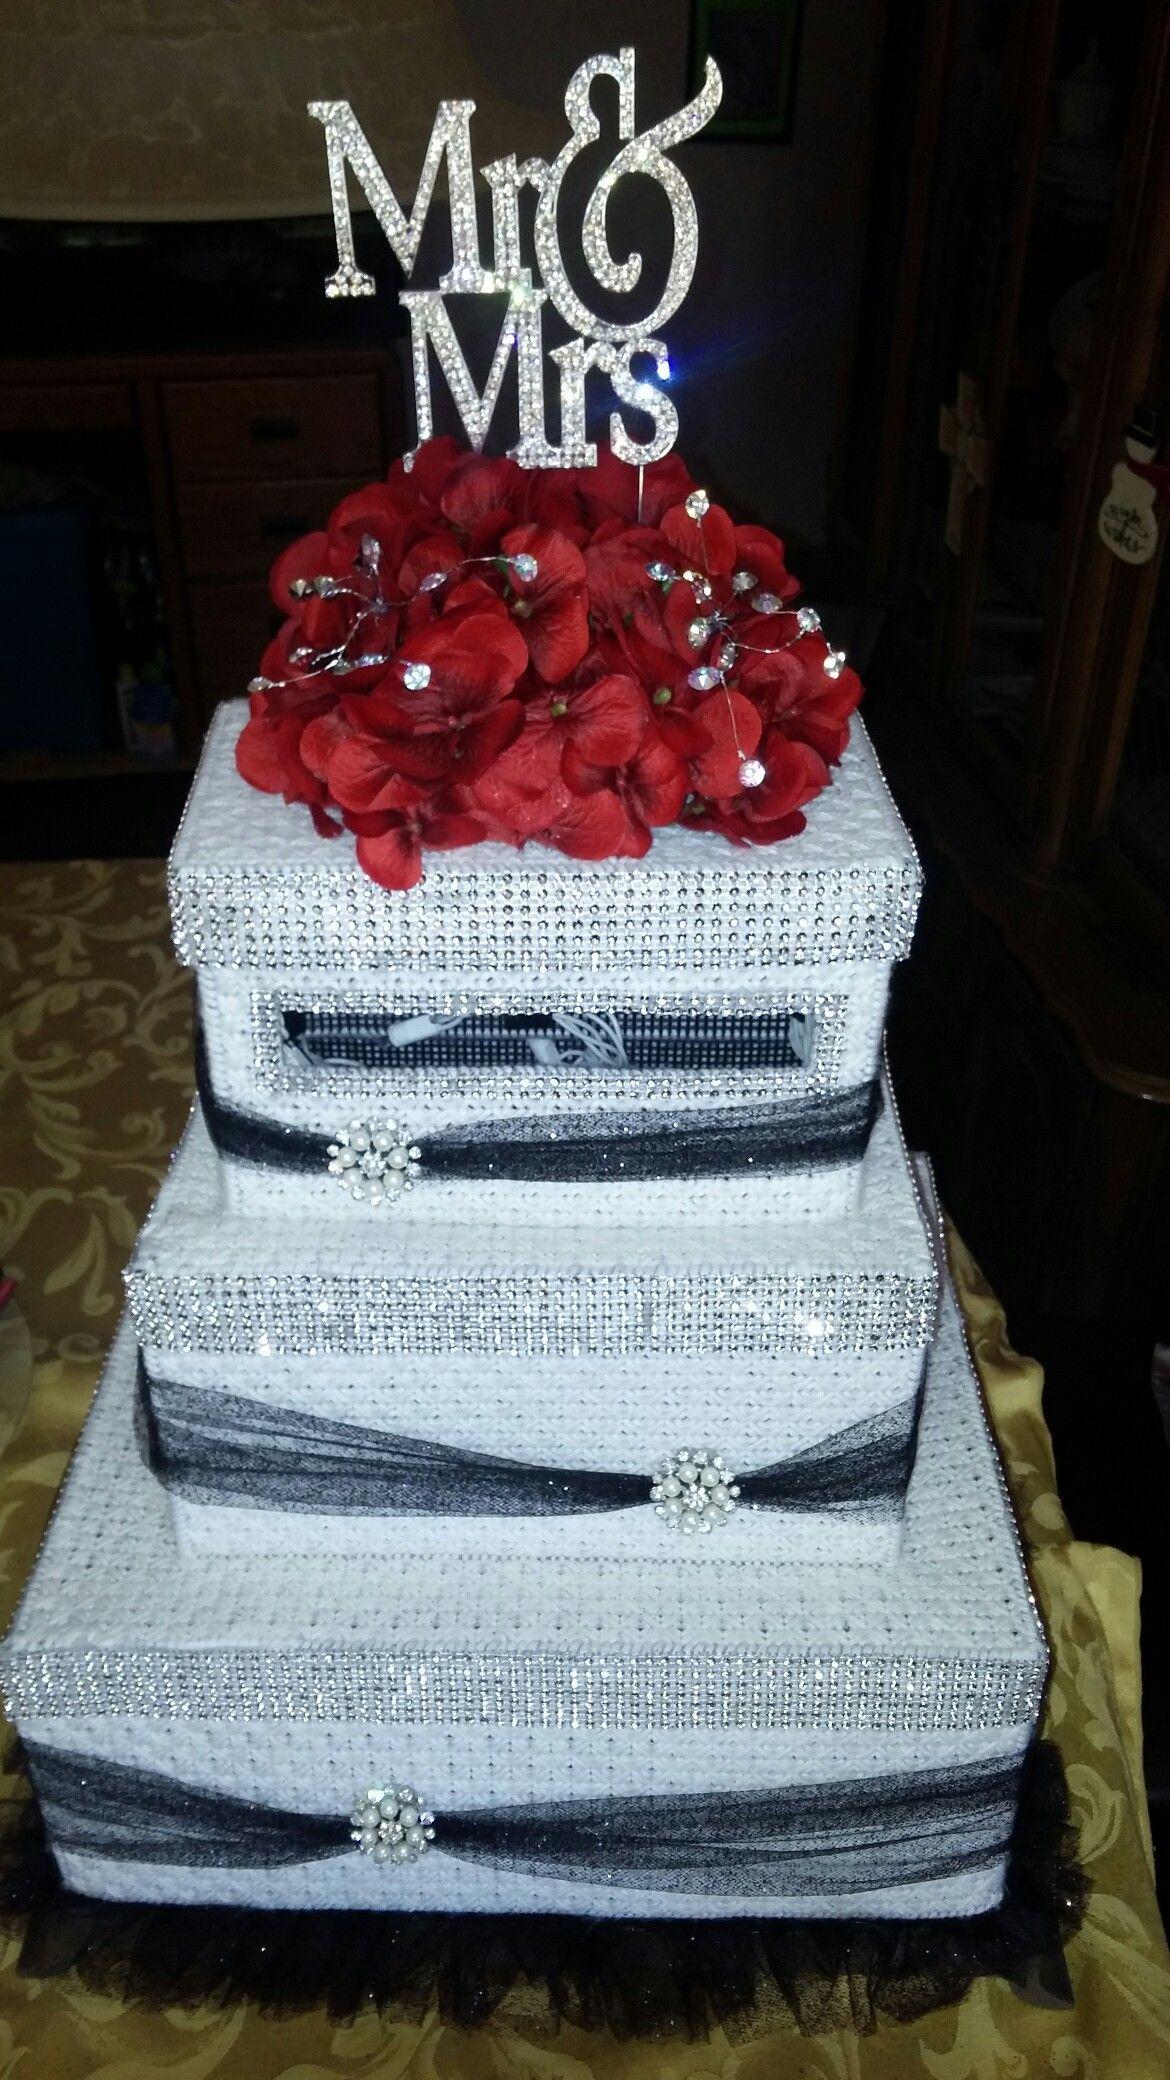 Plastic Canvas Wedding Cake Box With Lights Boxes Card: Card Box Wedding Cake Ideas At Websimilar.org